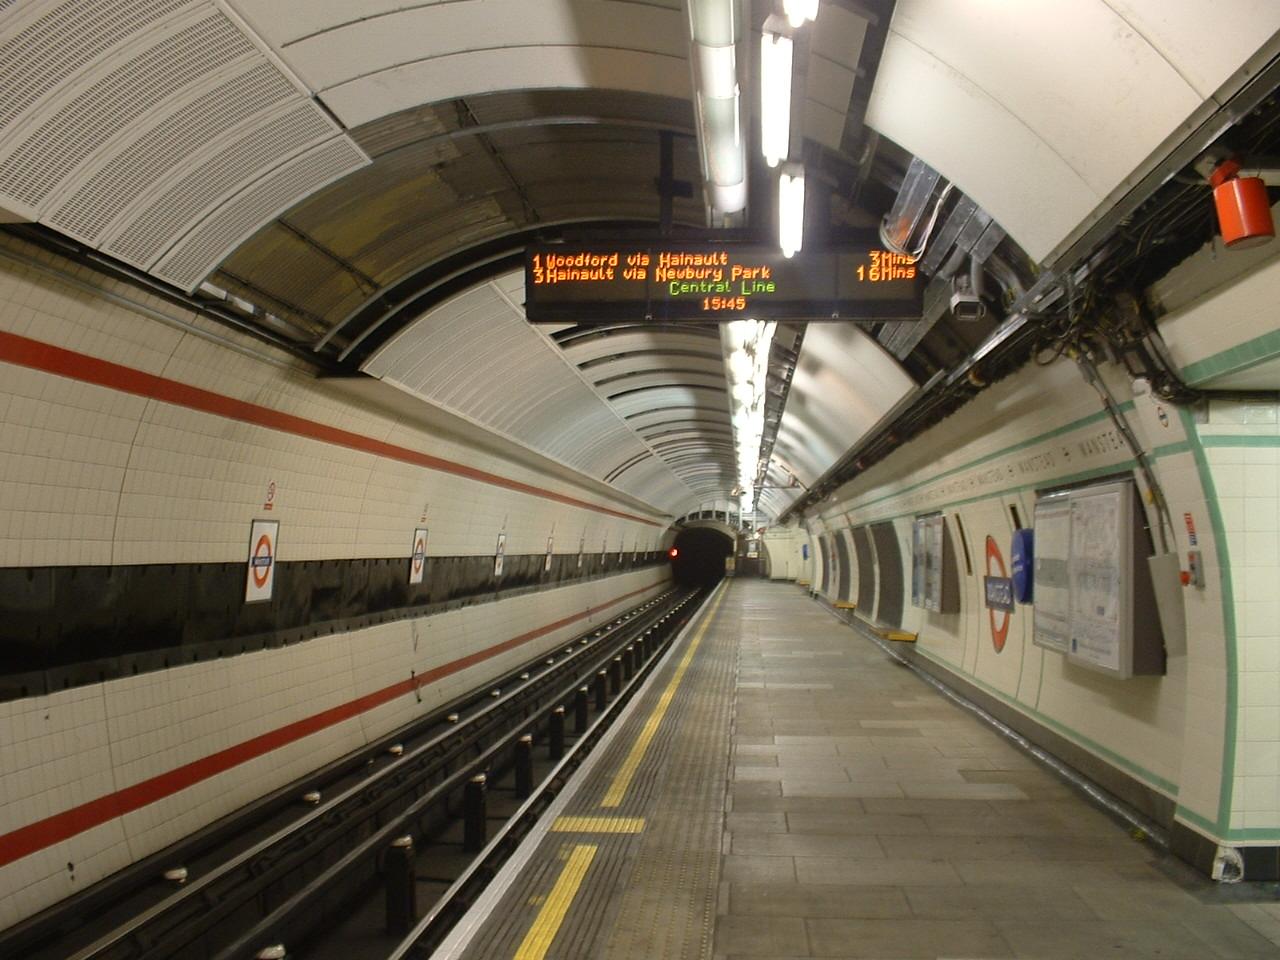 File:Wanstead London Underground station eastbound.JPG London Underground Stations